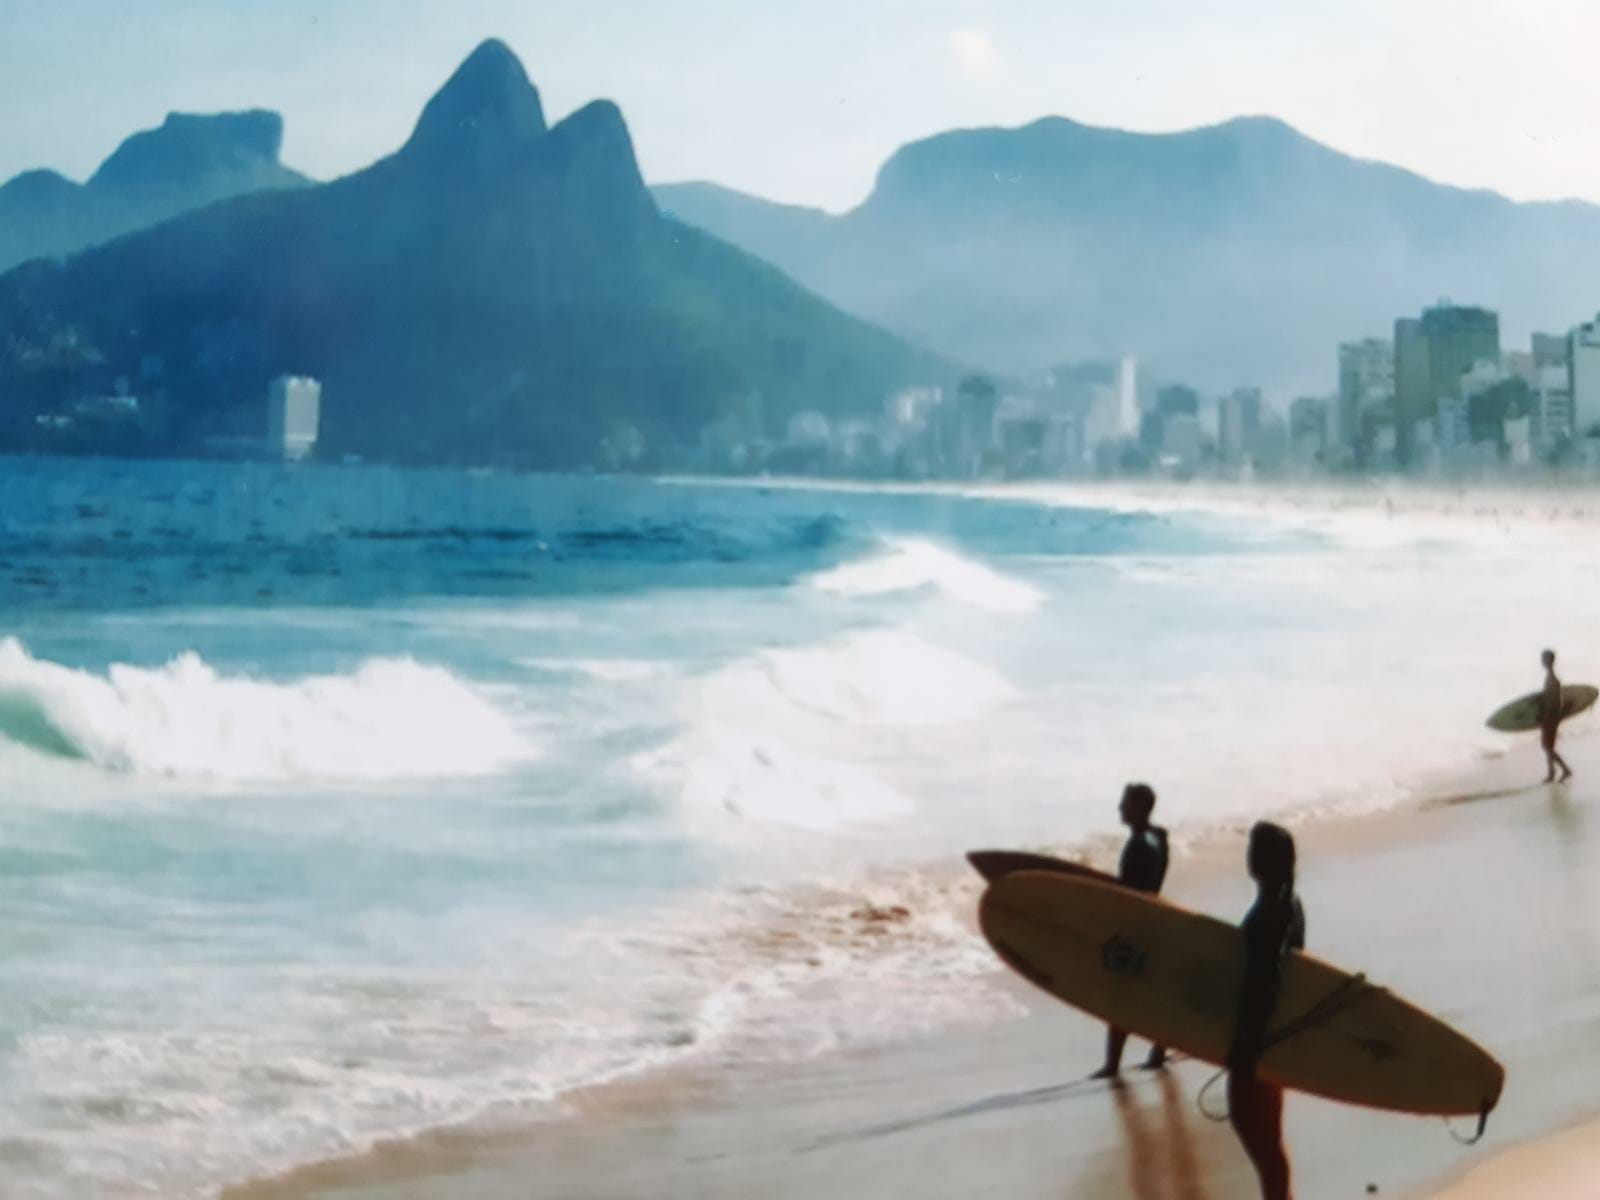 Itzi en Rio de Janeiro dispuesta a surfear.